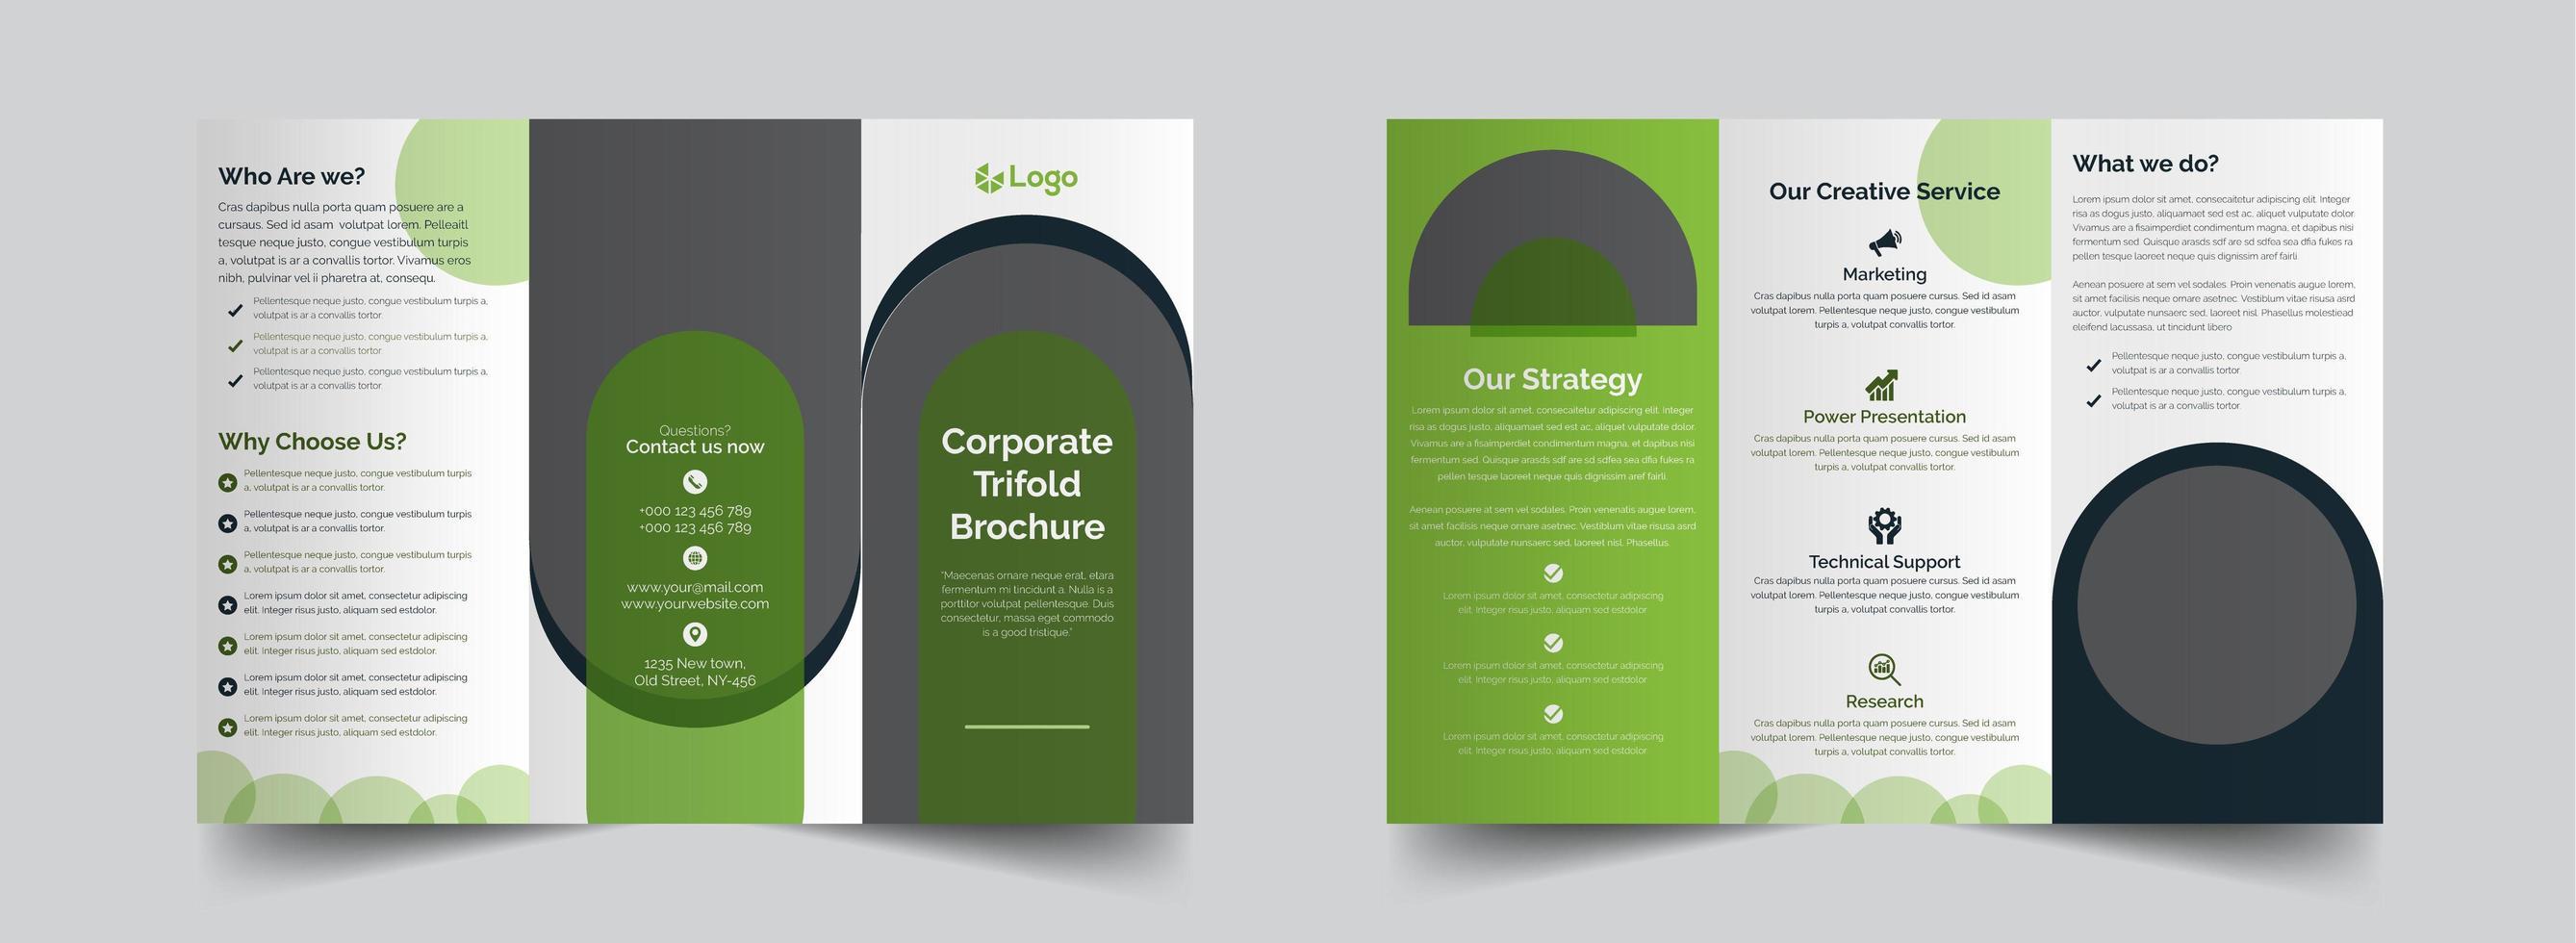 corporate green trifold brochure design template vector